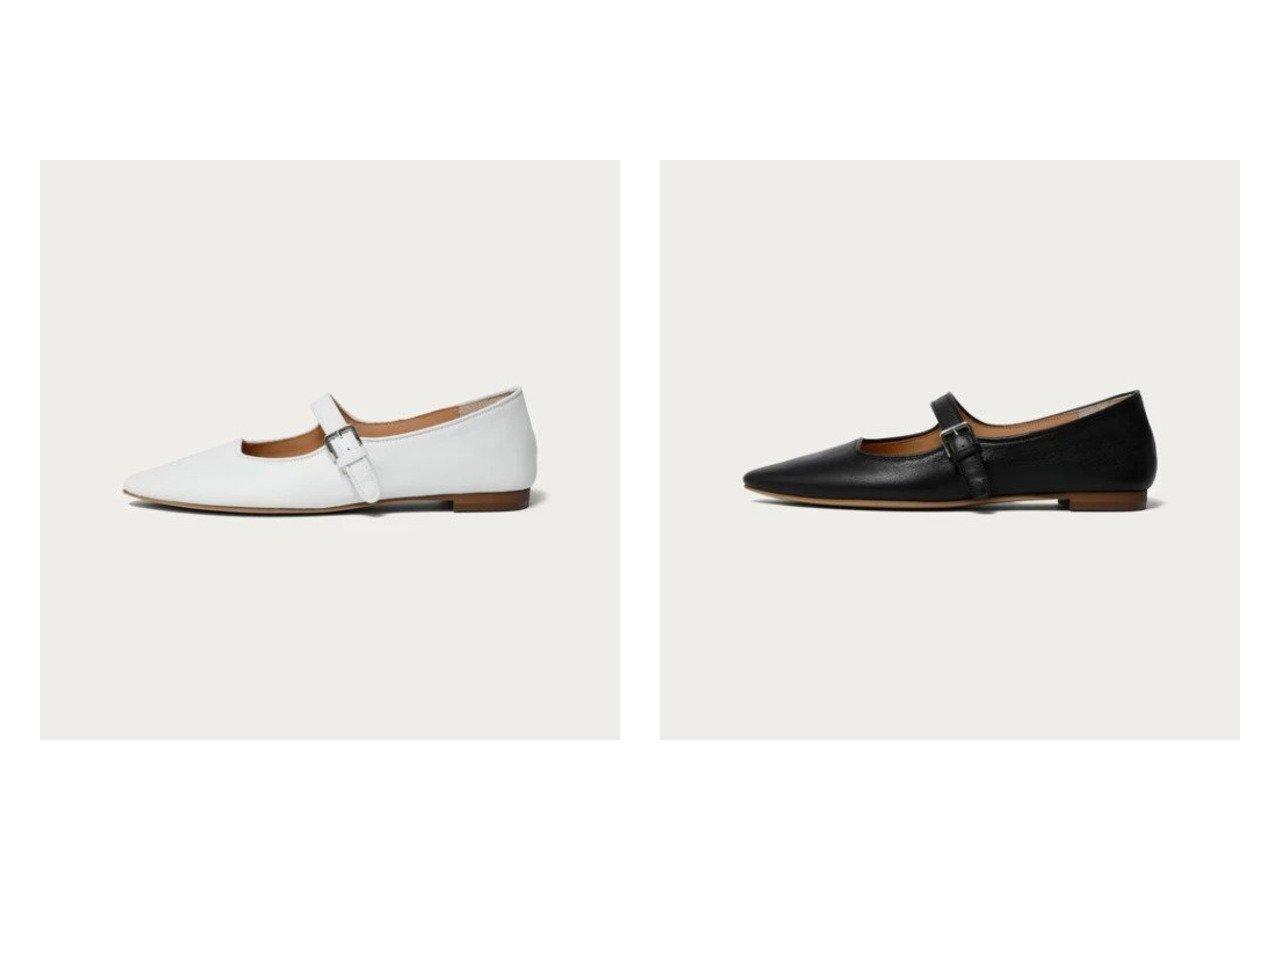 【Odette e Odile/オデット エ オディール】のOFD ストラップソフト FLT10↓↑ シューズ・靴のおすすめ!人気、トレンド・レディースファッションの通販 おすすめで人気の流行・トレンド、ファッションの通販商品 メンズファッション・キッズファッション・インテリア・家具・レディースファッション・服の通販 founy(ファニー) https://founy.com/ ファッション Fashion レディースファッション WOMEN シューズ バランス フラット  ID:crp329100000012464